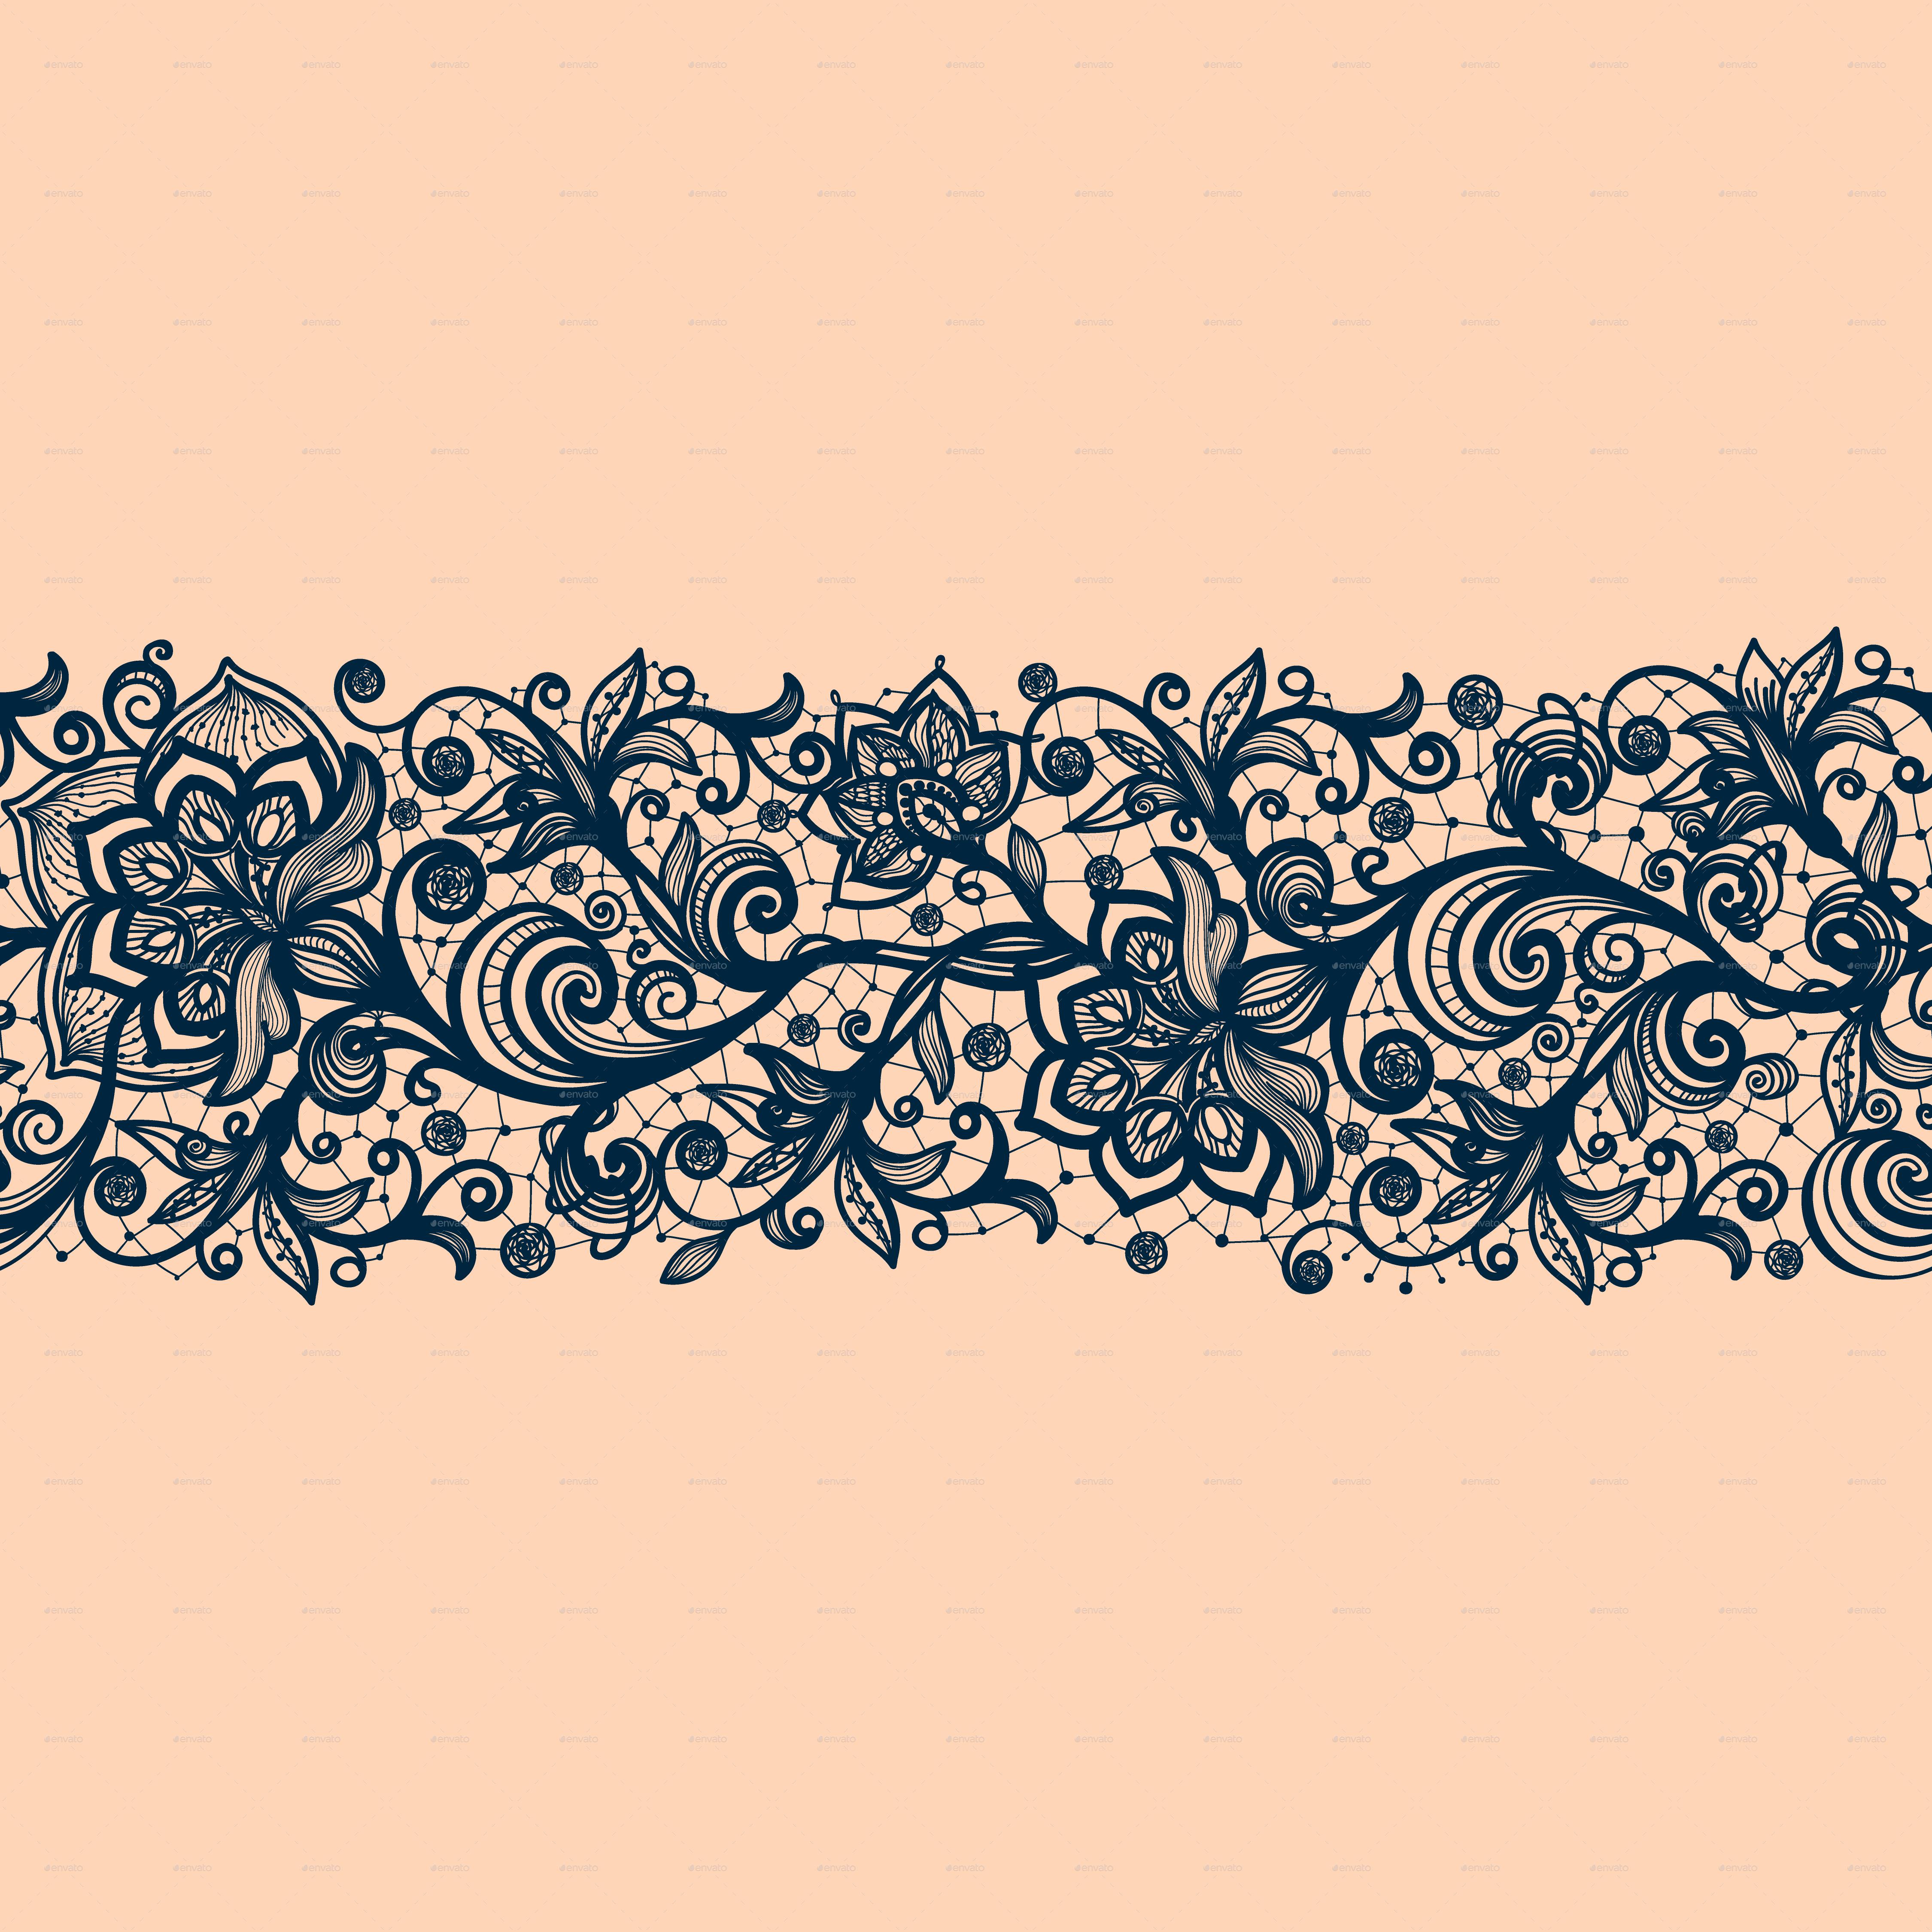 25_1.png 25_2.jpg PlusPng.com  - Simple Lace Patterns PNG